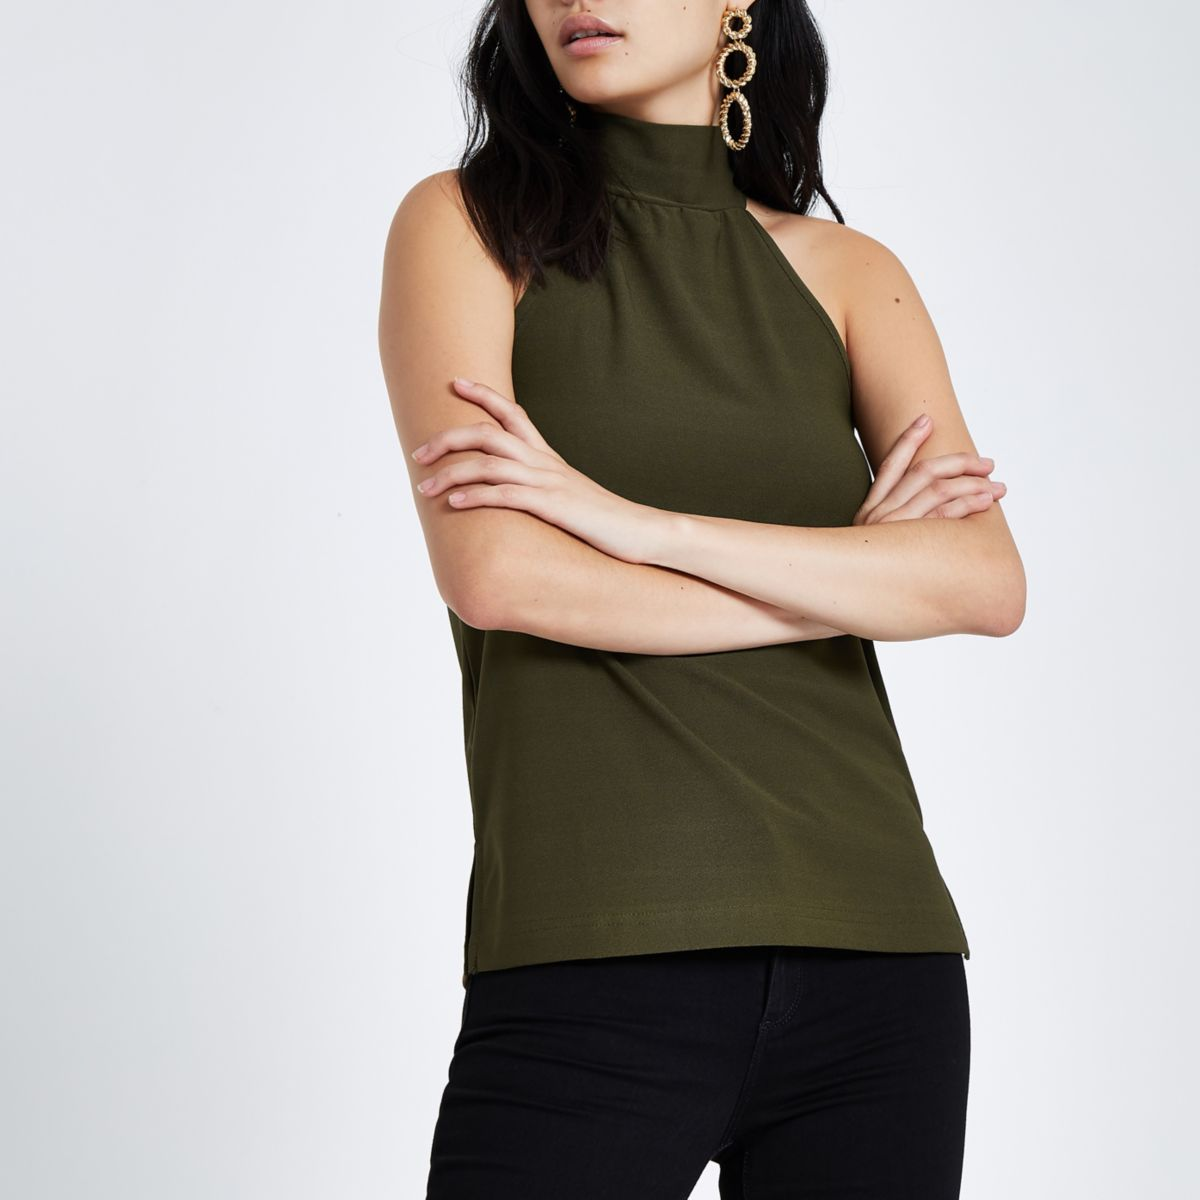 Khaki halter neck sleeveless top